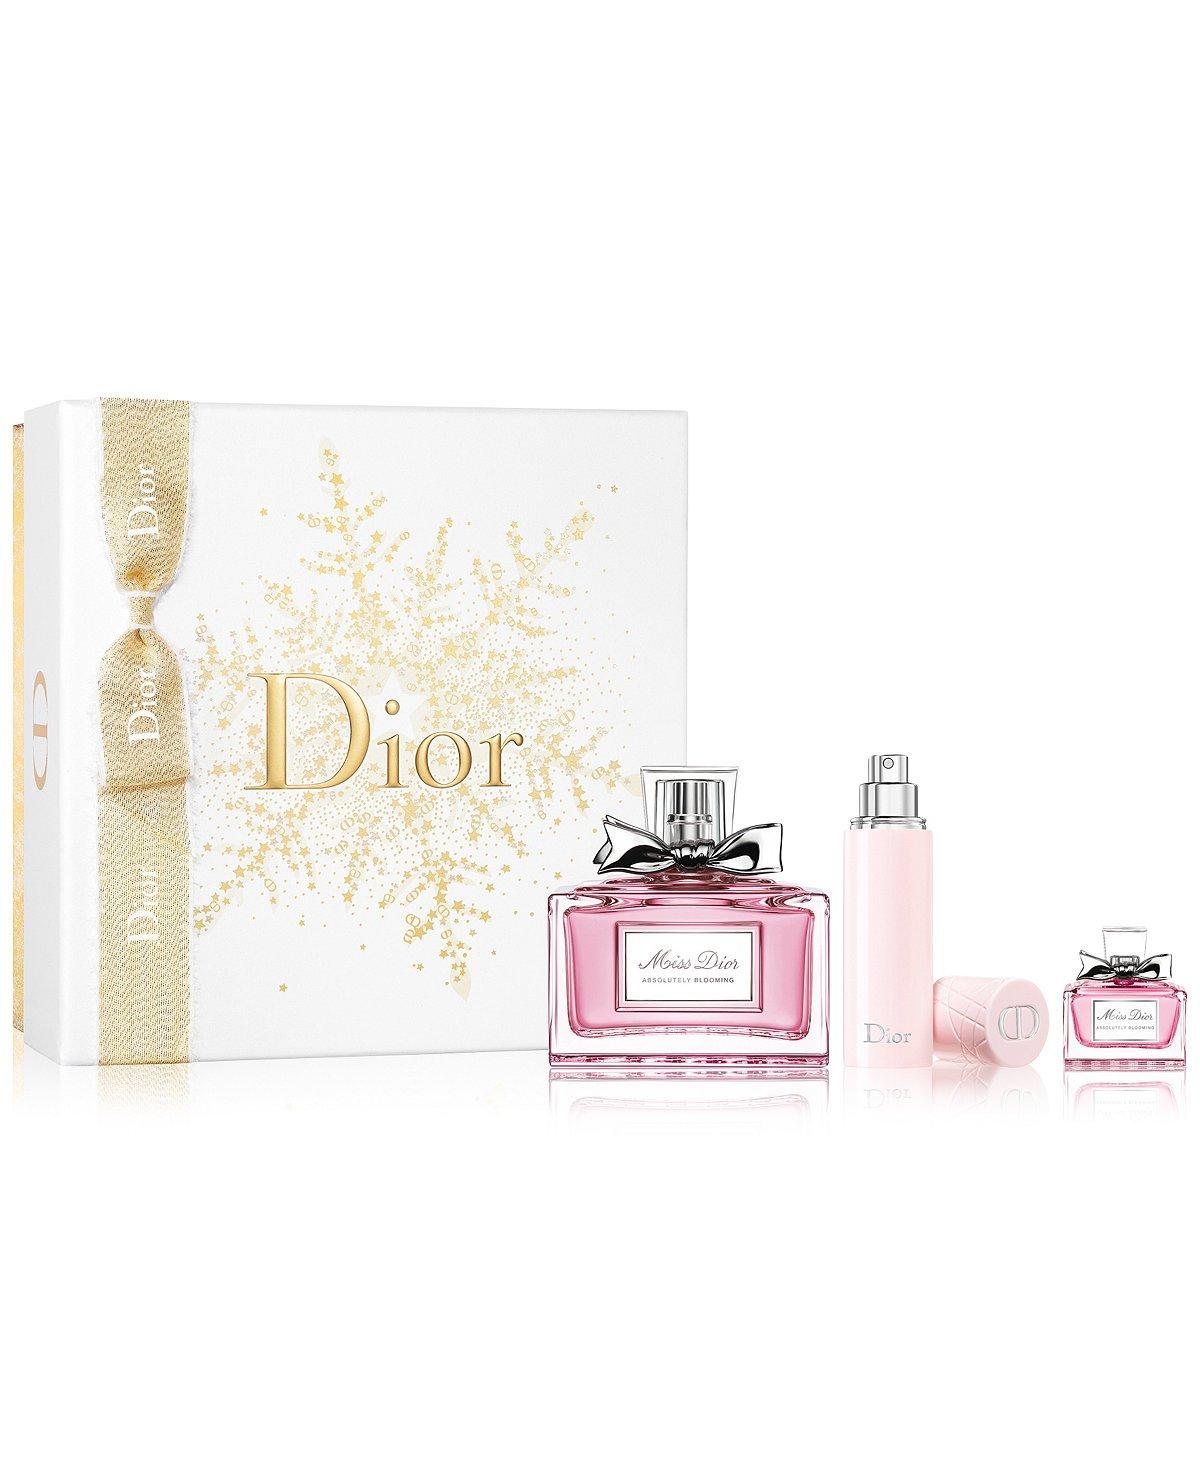 Miss Dior Absolutely Blooming 3-Piece Perfume Gift Set for WOMEN (100 ml EDP Spray, 10 ml Travel Spray, 5 ml EDP Miniature)